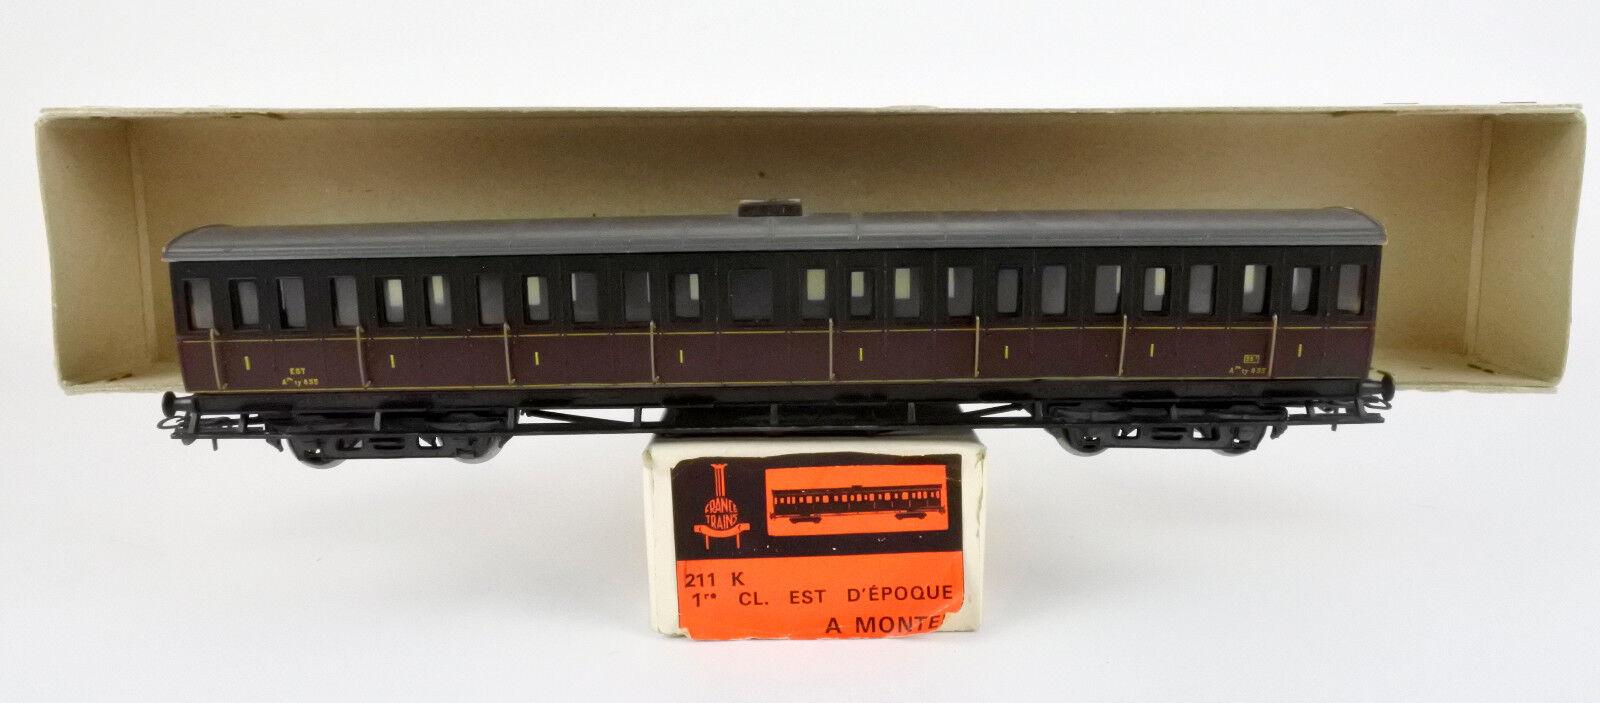 Francia Trenes Escala Ho 211K tipo ferroviaria francesa Ty est 1ST clase turismo